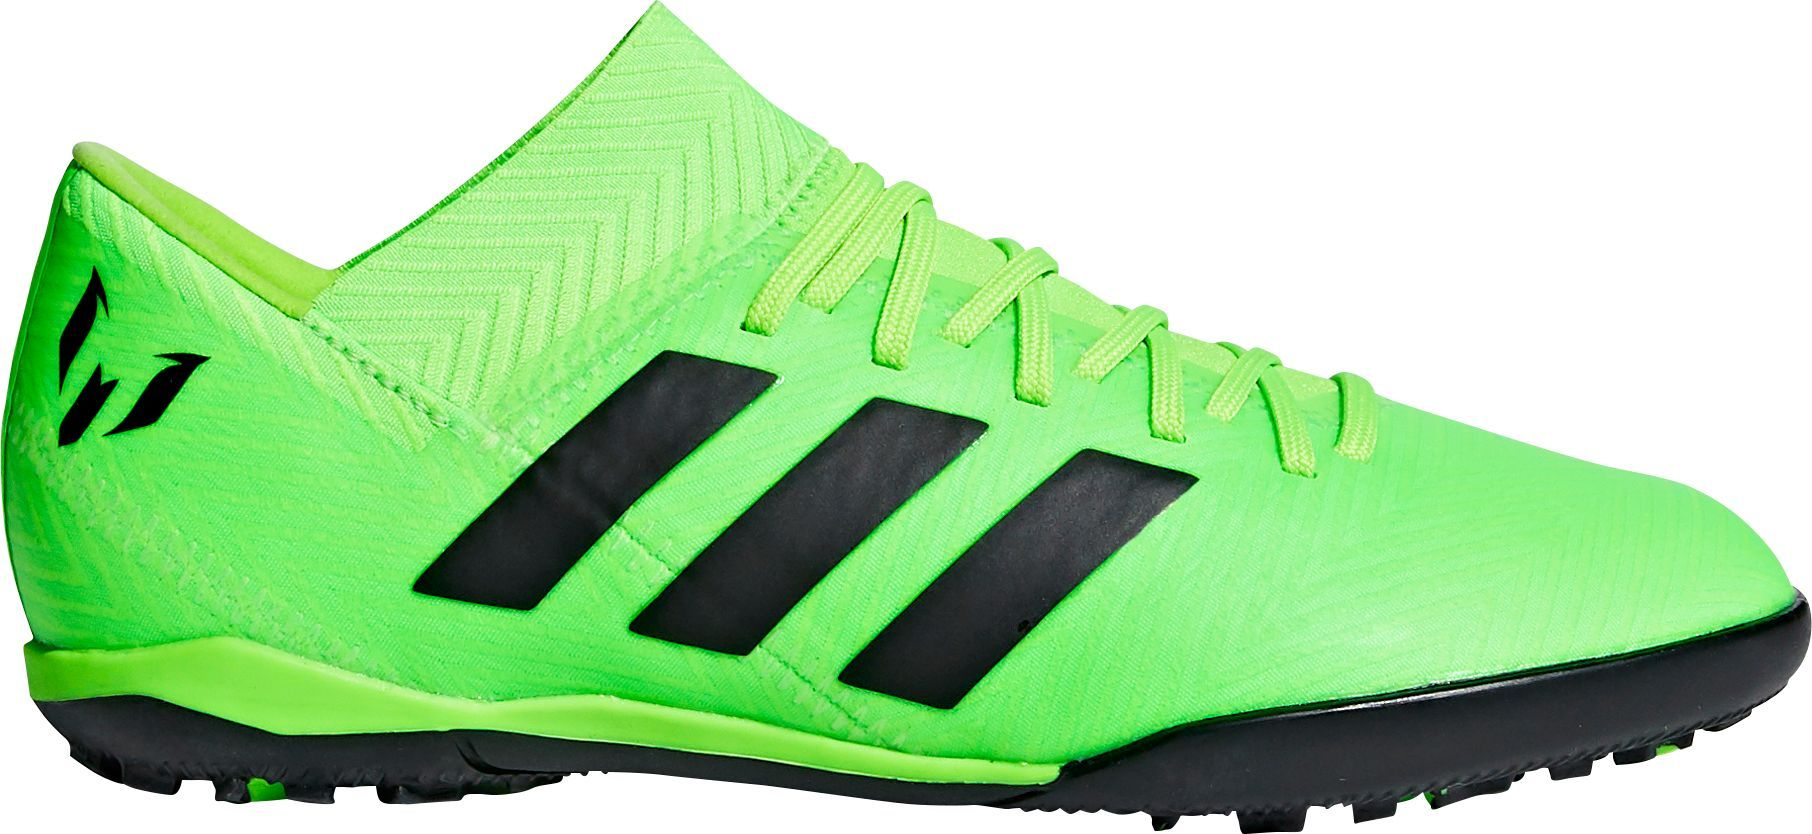 17e4a6820 adidas Kids' Nemeziz Messi Tango 18.3 TF Soccer Cleats, Boy's, Size: 6.0,  Green